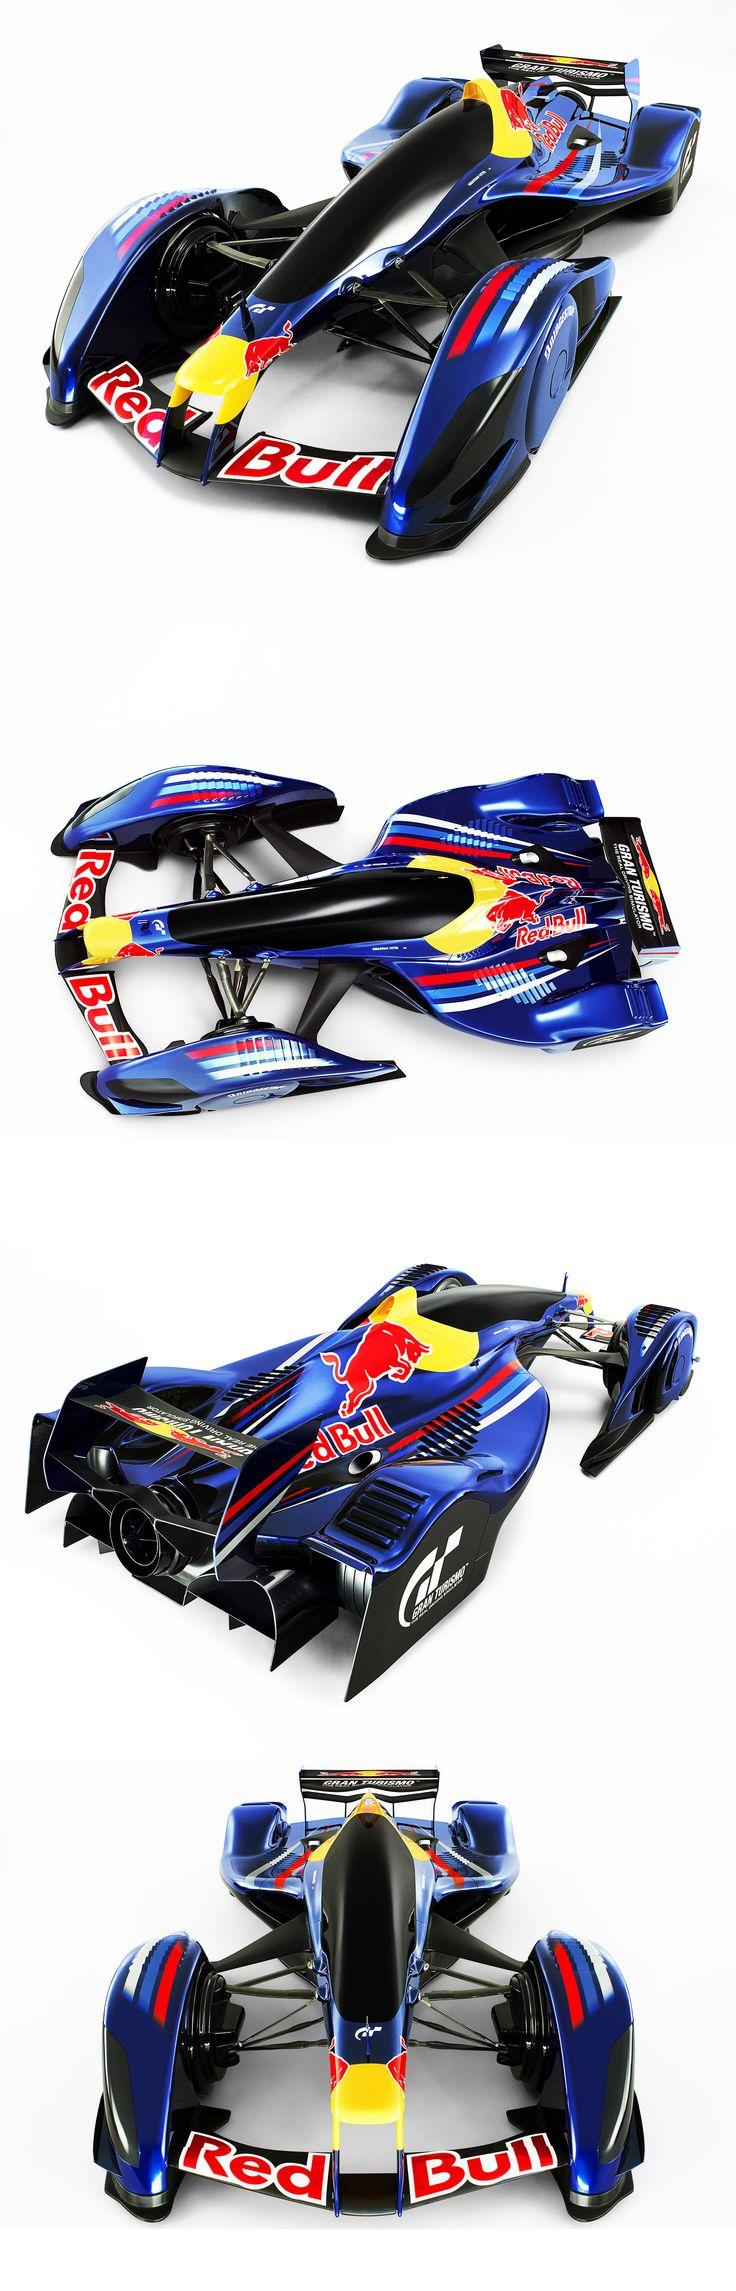 Red Bull X2010 F1 concept from Gran Turismo 5